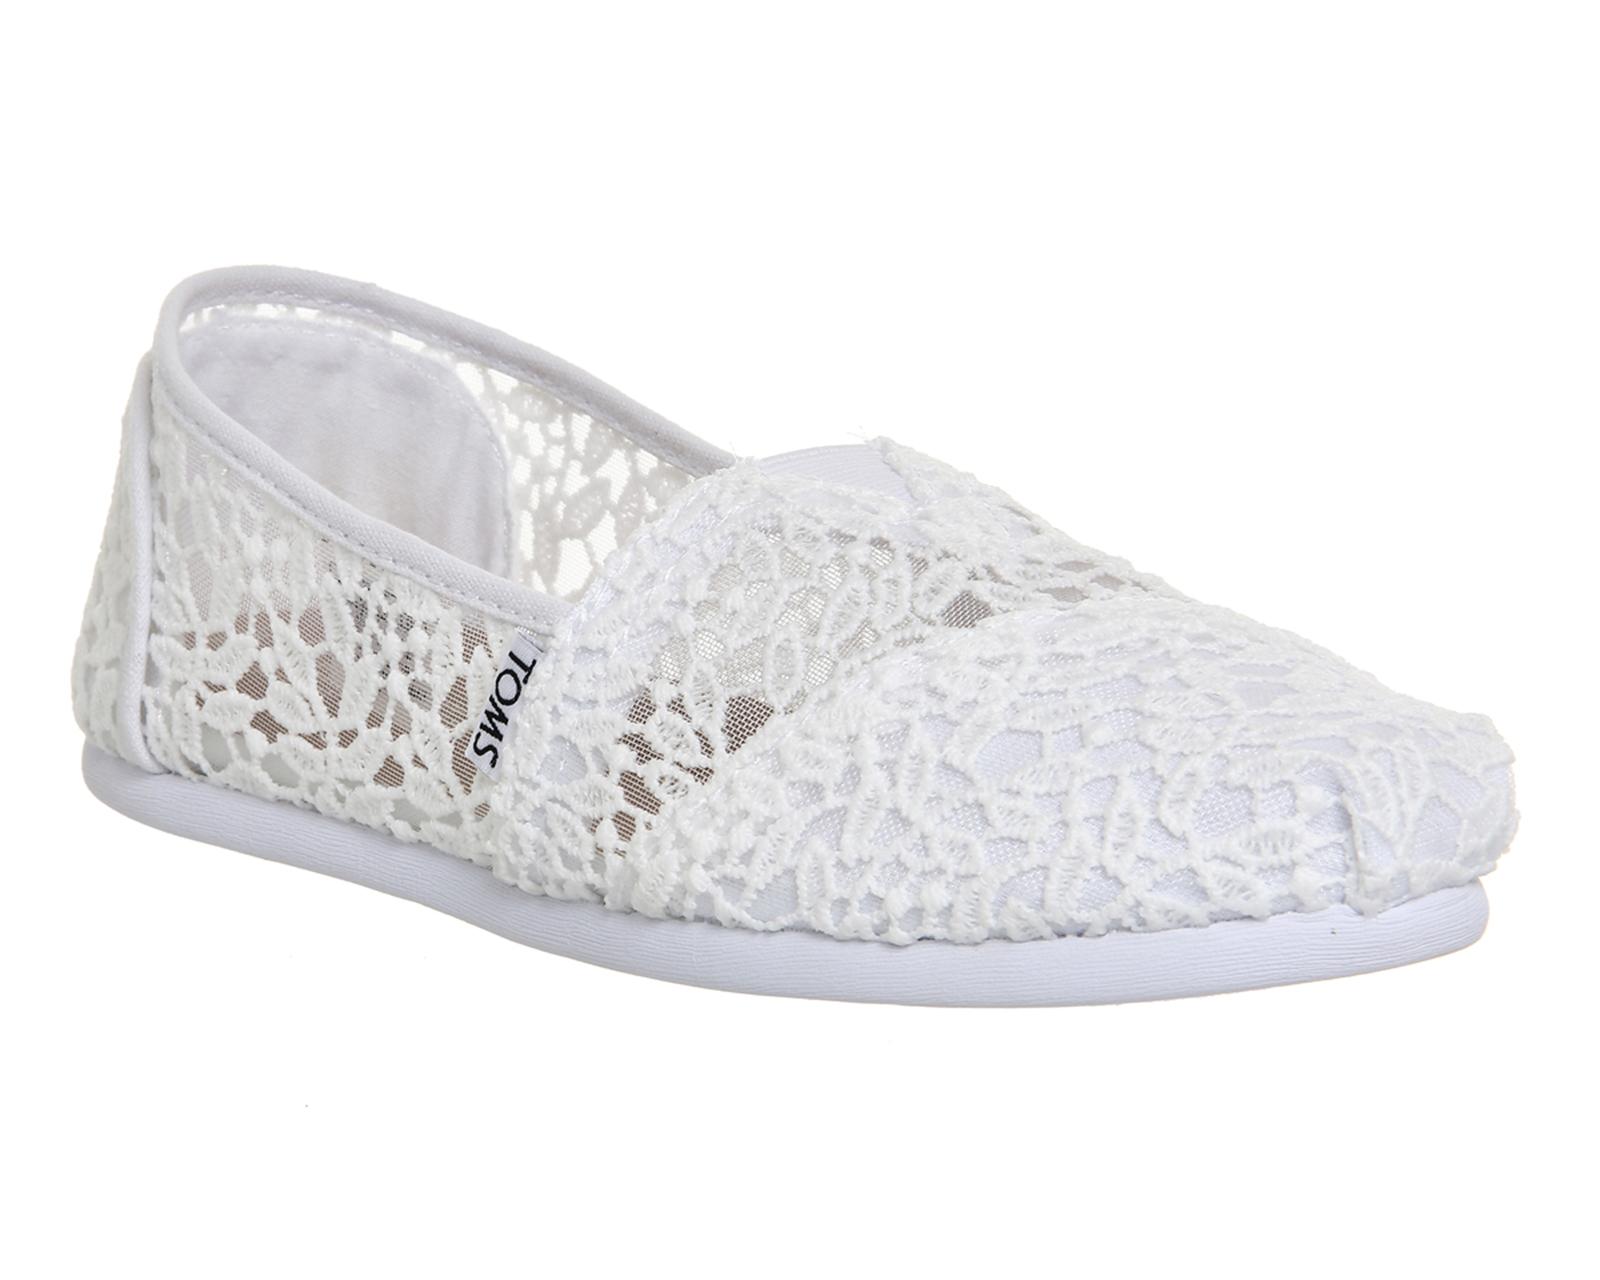 Toms Classic White Lace Leaves Womens Espadrilles Slipons-8 IJGIsDsox